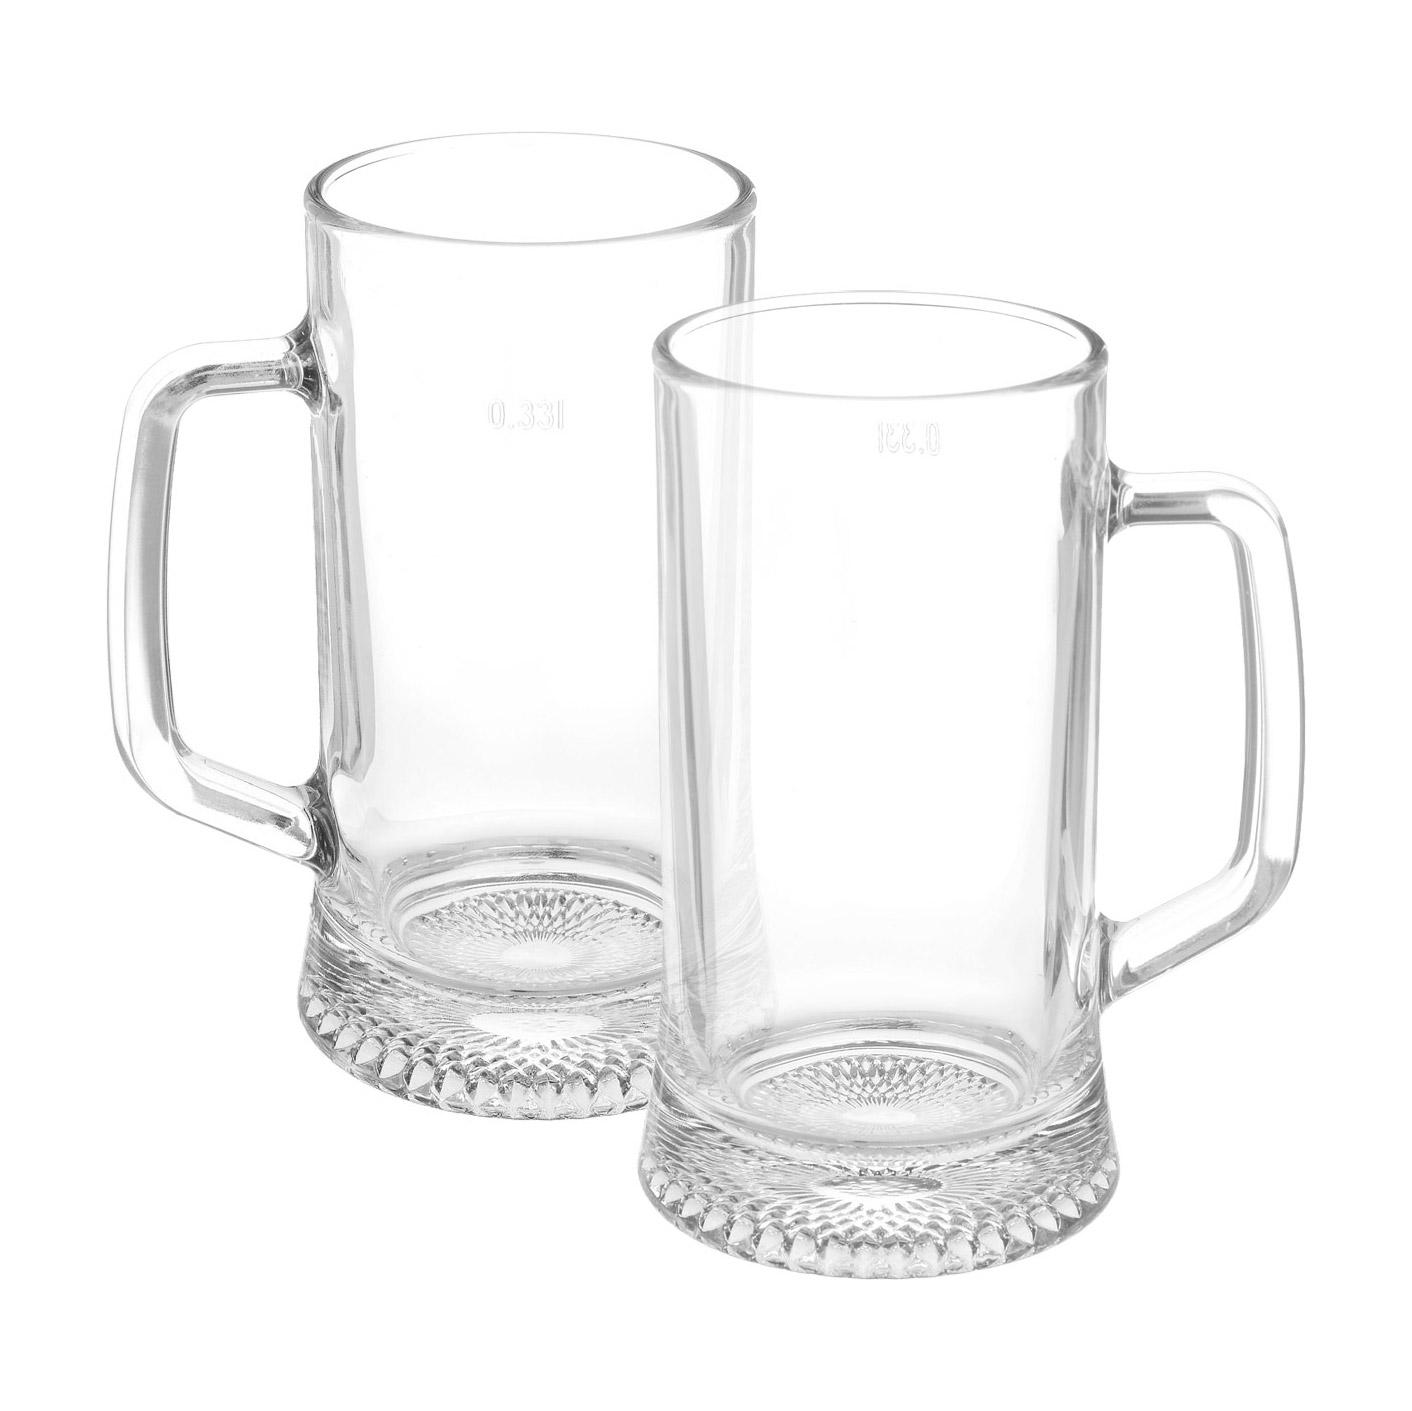 Набор кружек Luminarc Dresden для пива 330 мл 2 шт набор кружек для пива гамбург 2шт 500мл стекло